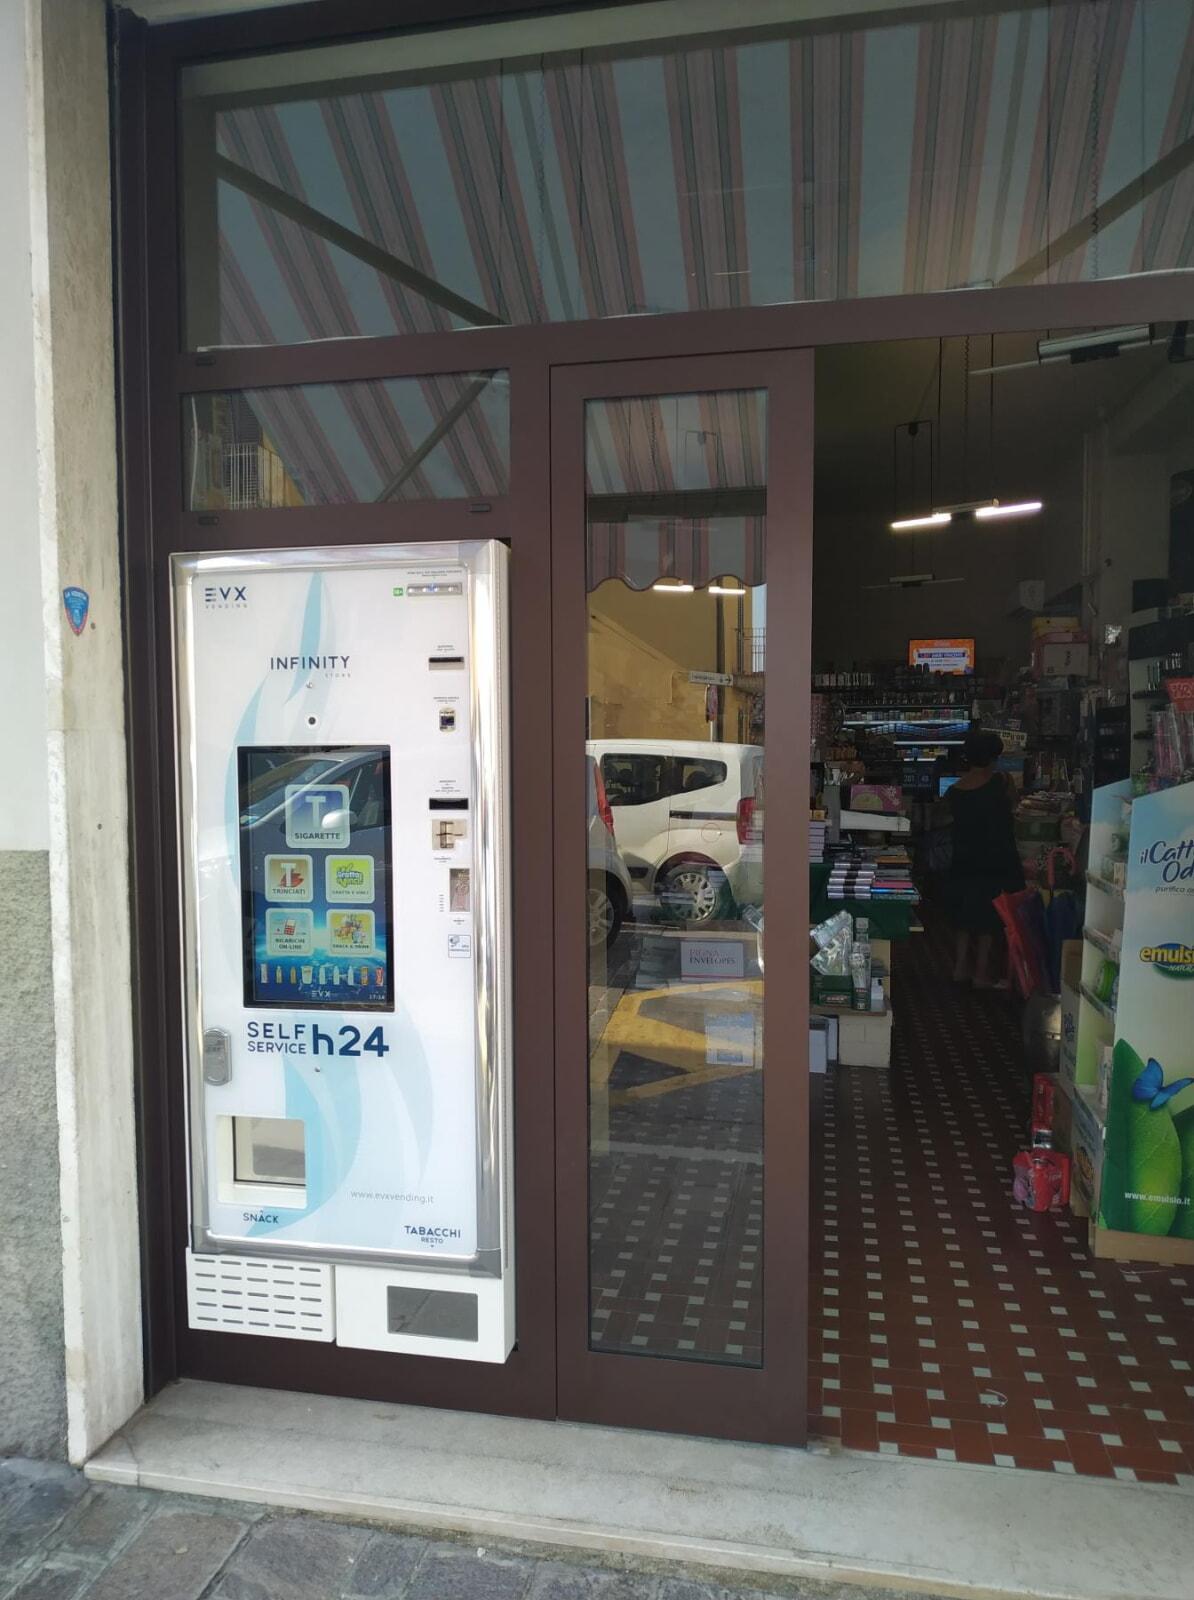 distributore-automatico-sigarette-evx-infinity_store (2)